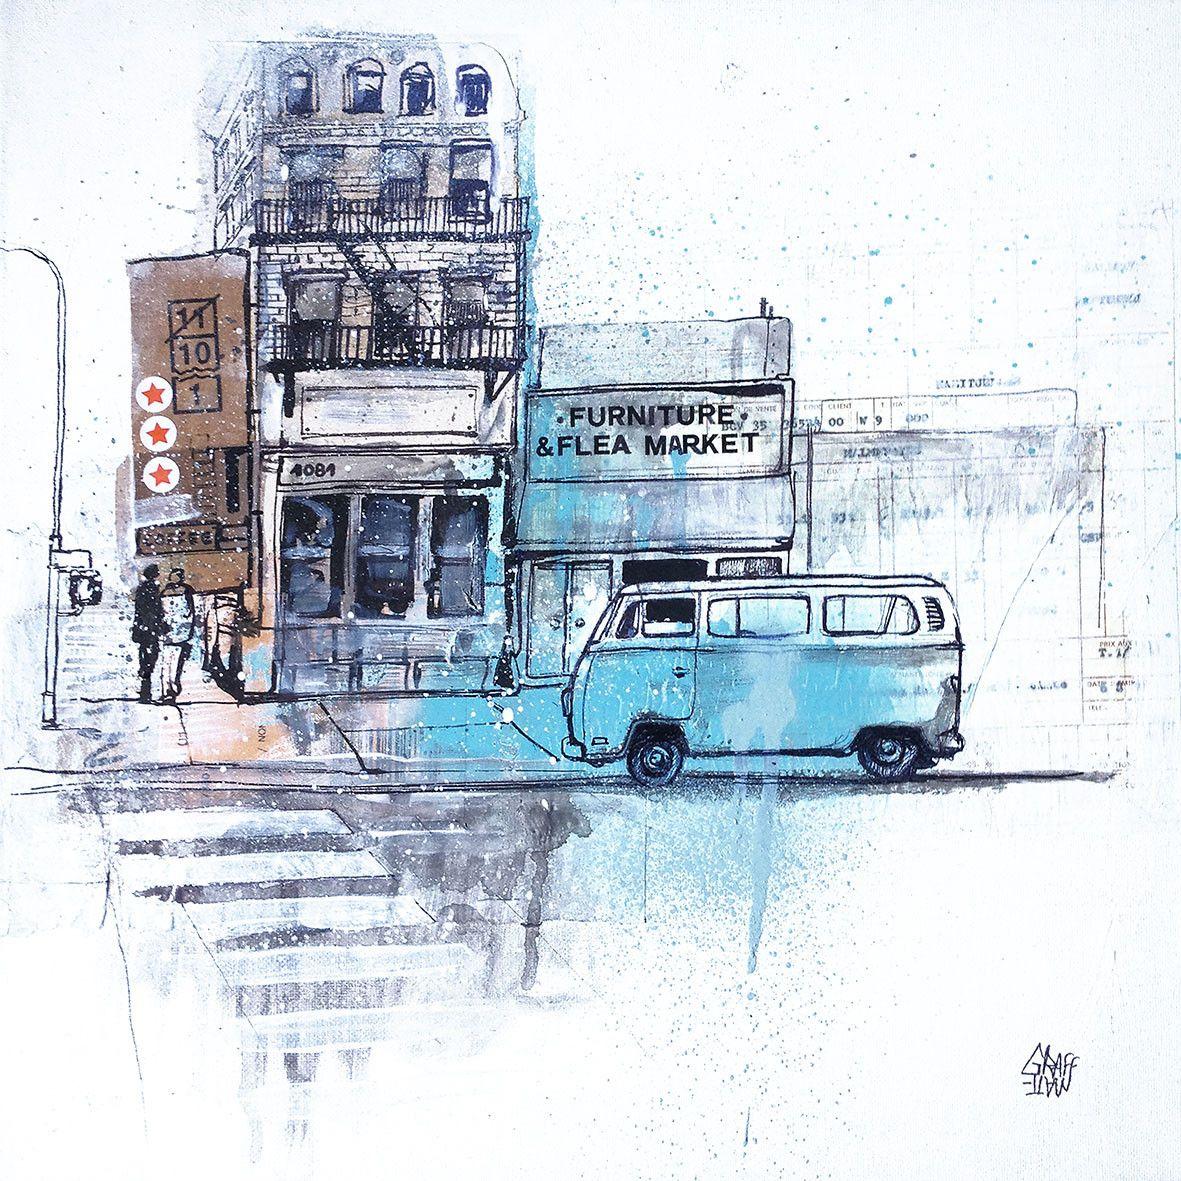 """Brooklyn Van"" by GRAFFMATT #graffmatt #brooklyn #van #painting #art #urbanart #urbanscene #urban #city #cityscape"